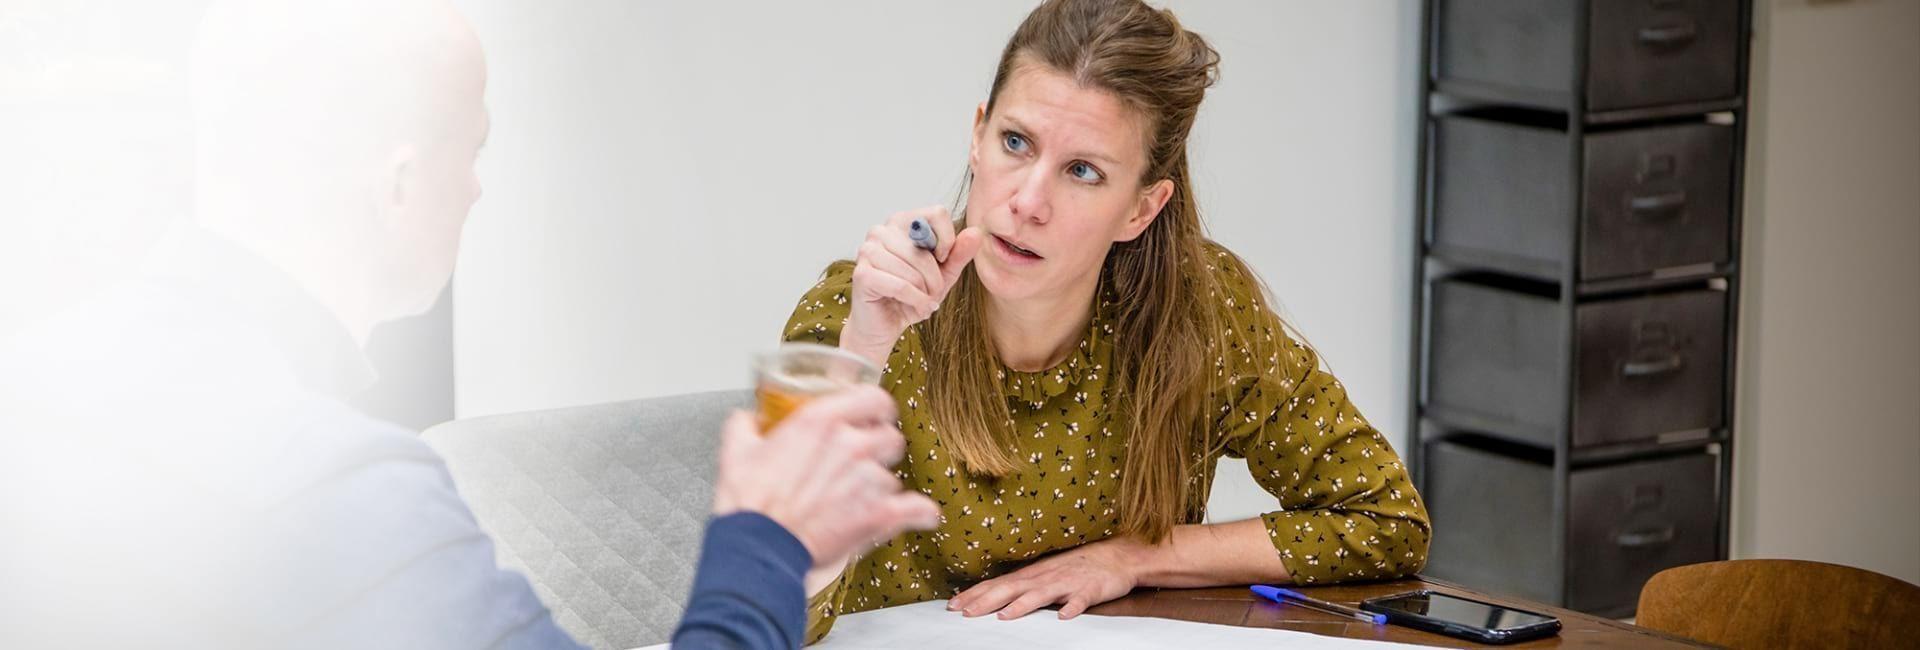 Pedagogisch coach opleiding